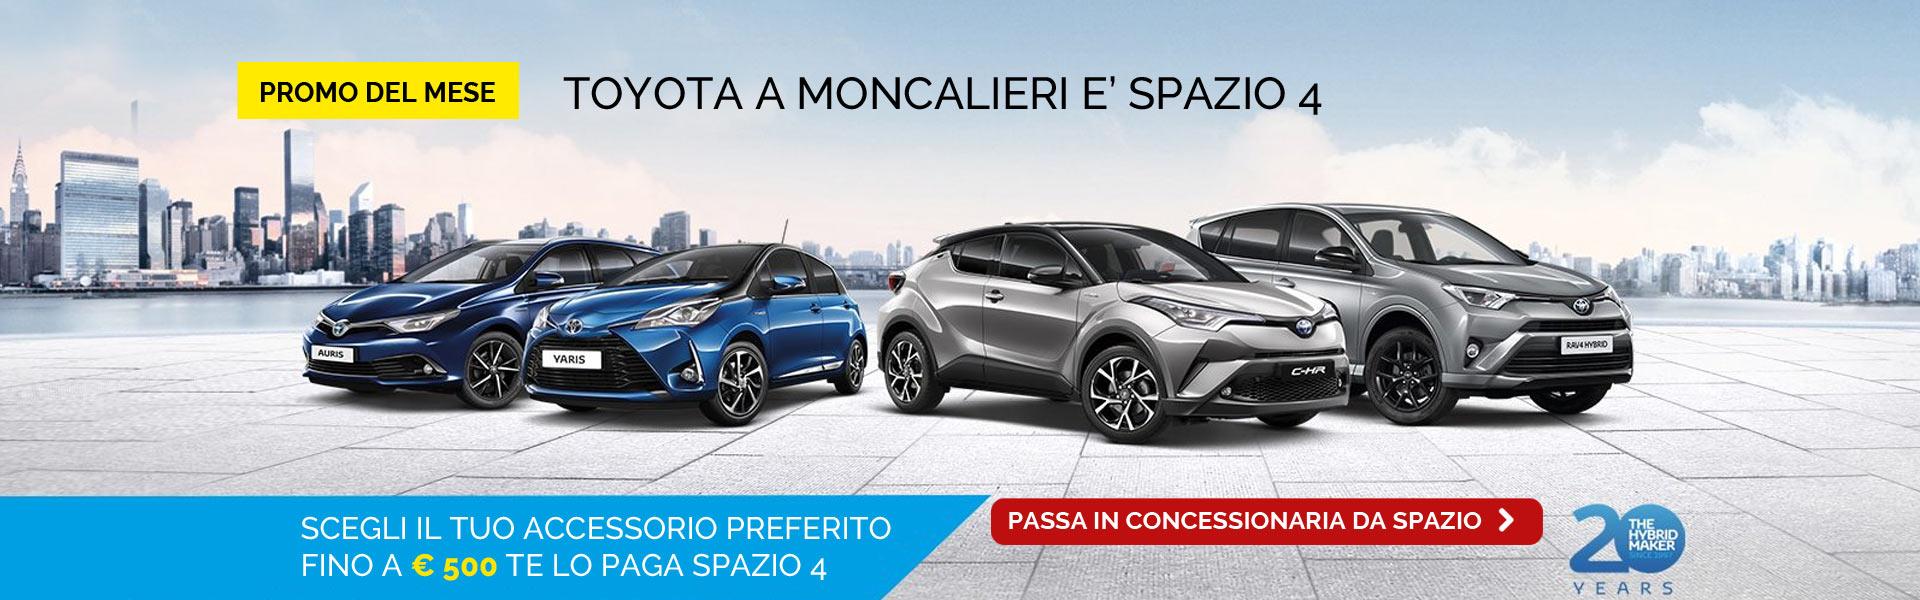 Concessionaria Toyota a Moncalieri